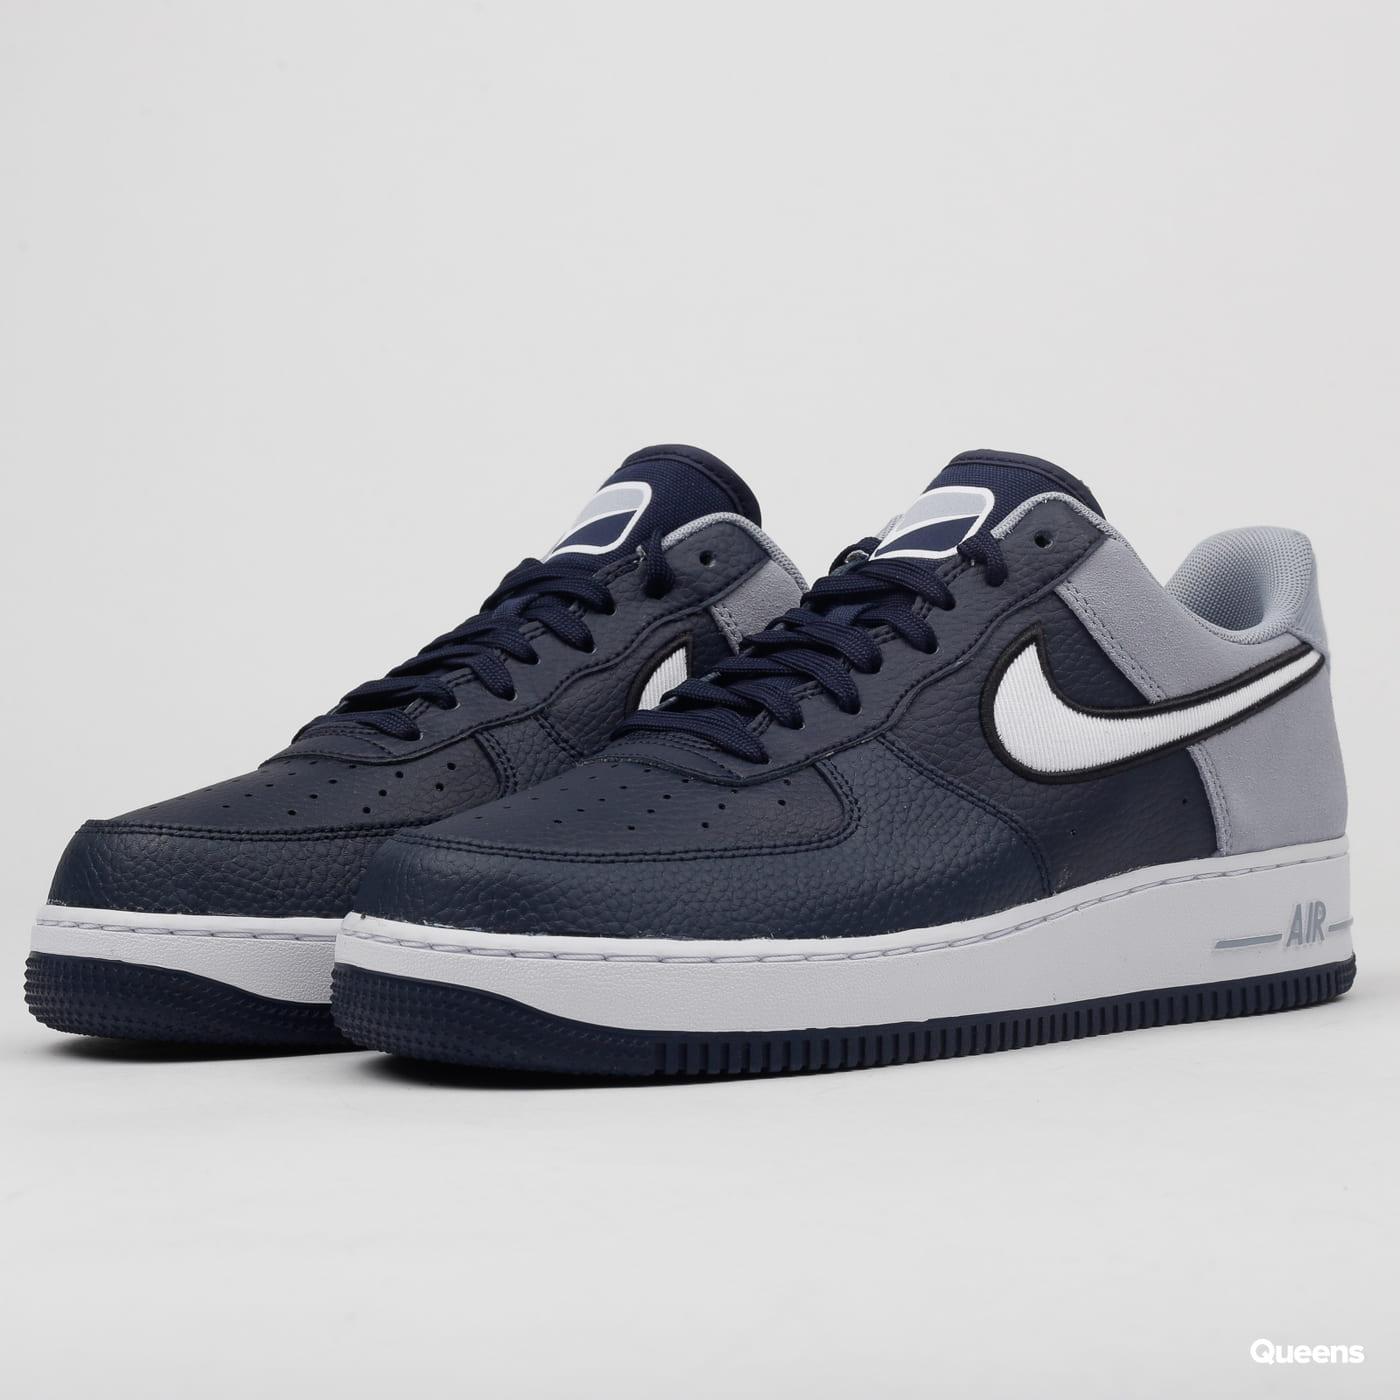 Sneakers Nike Air Force 1 '07 LV8 1